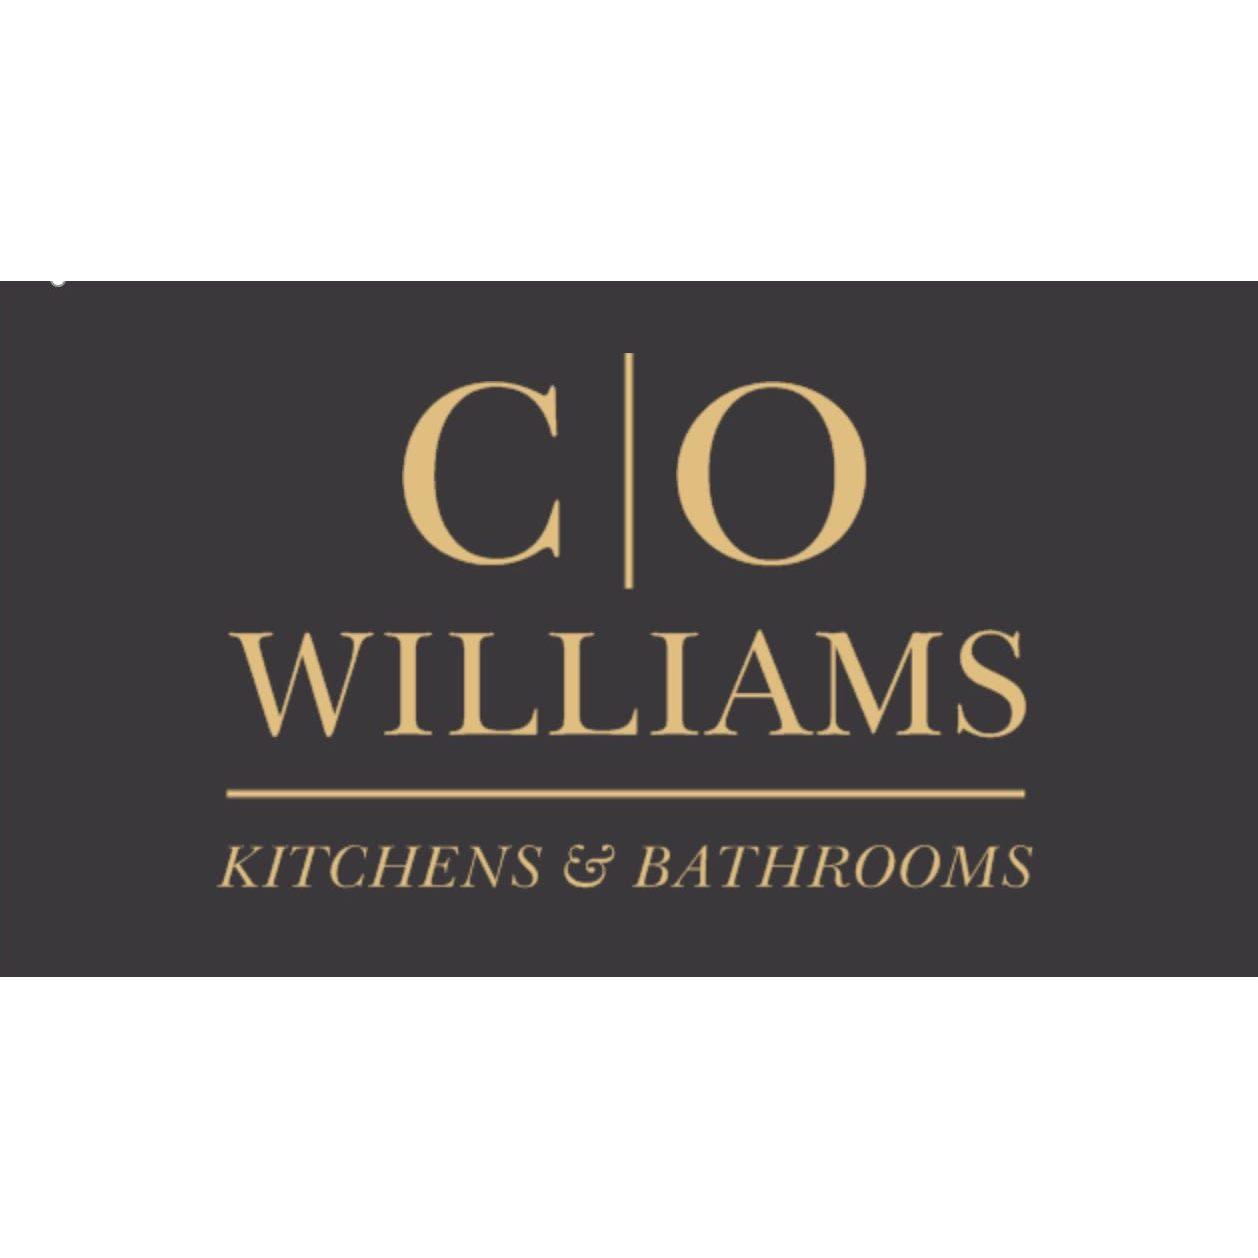 C&O Williams Kitchens & Bathrooms - Caldicot, Gwent NP26 3EJ - 07905 394138 | ShowMeLocal.com